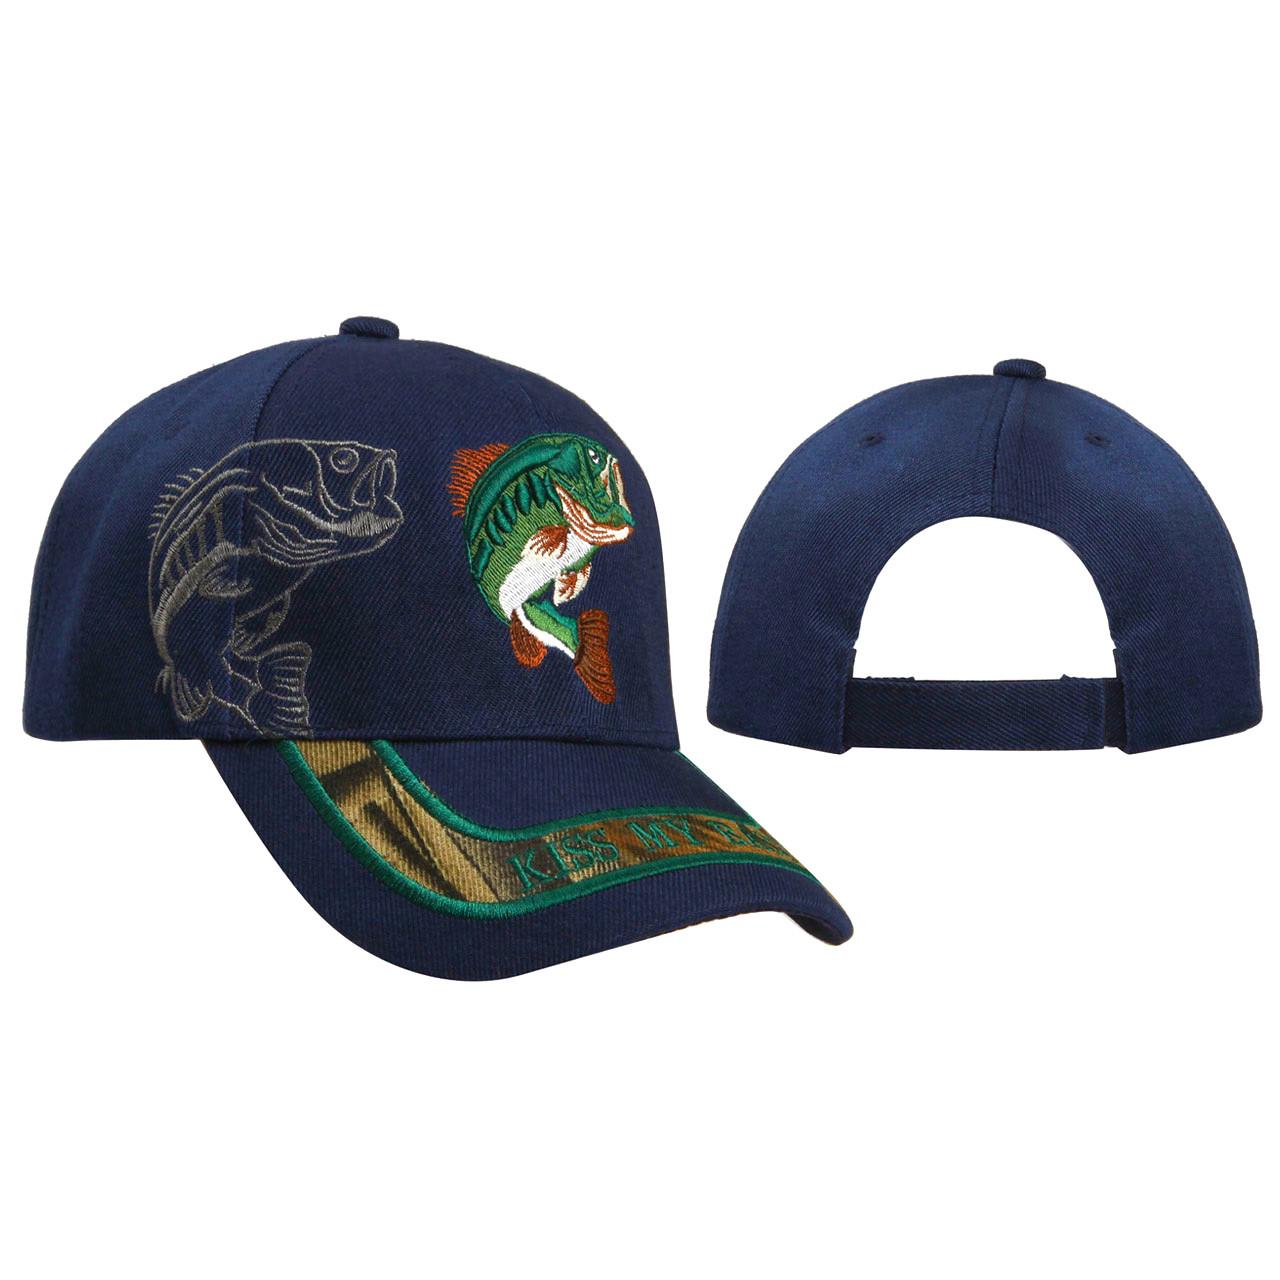 Navy Blue Wholesale Baseball Cap | Kiss my Bass